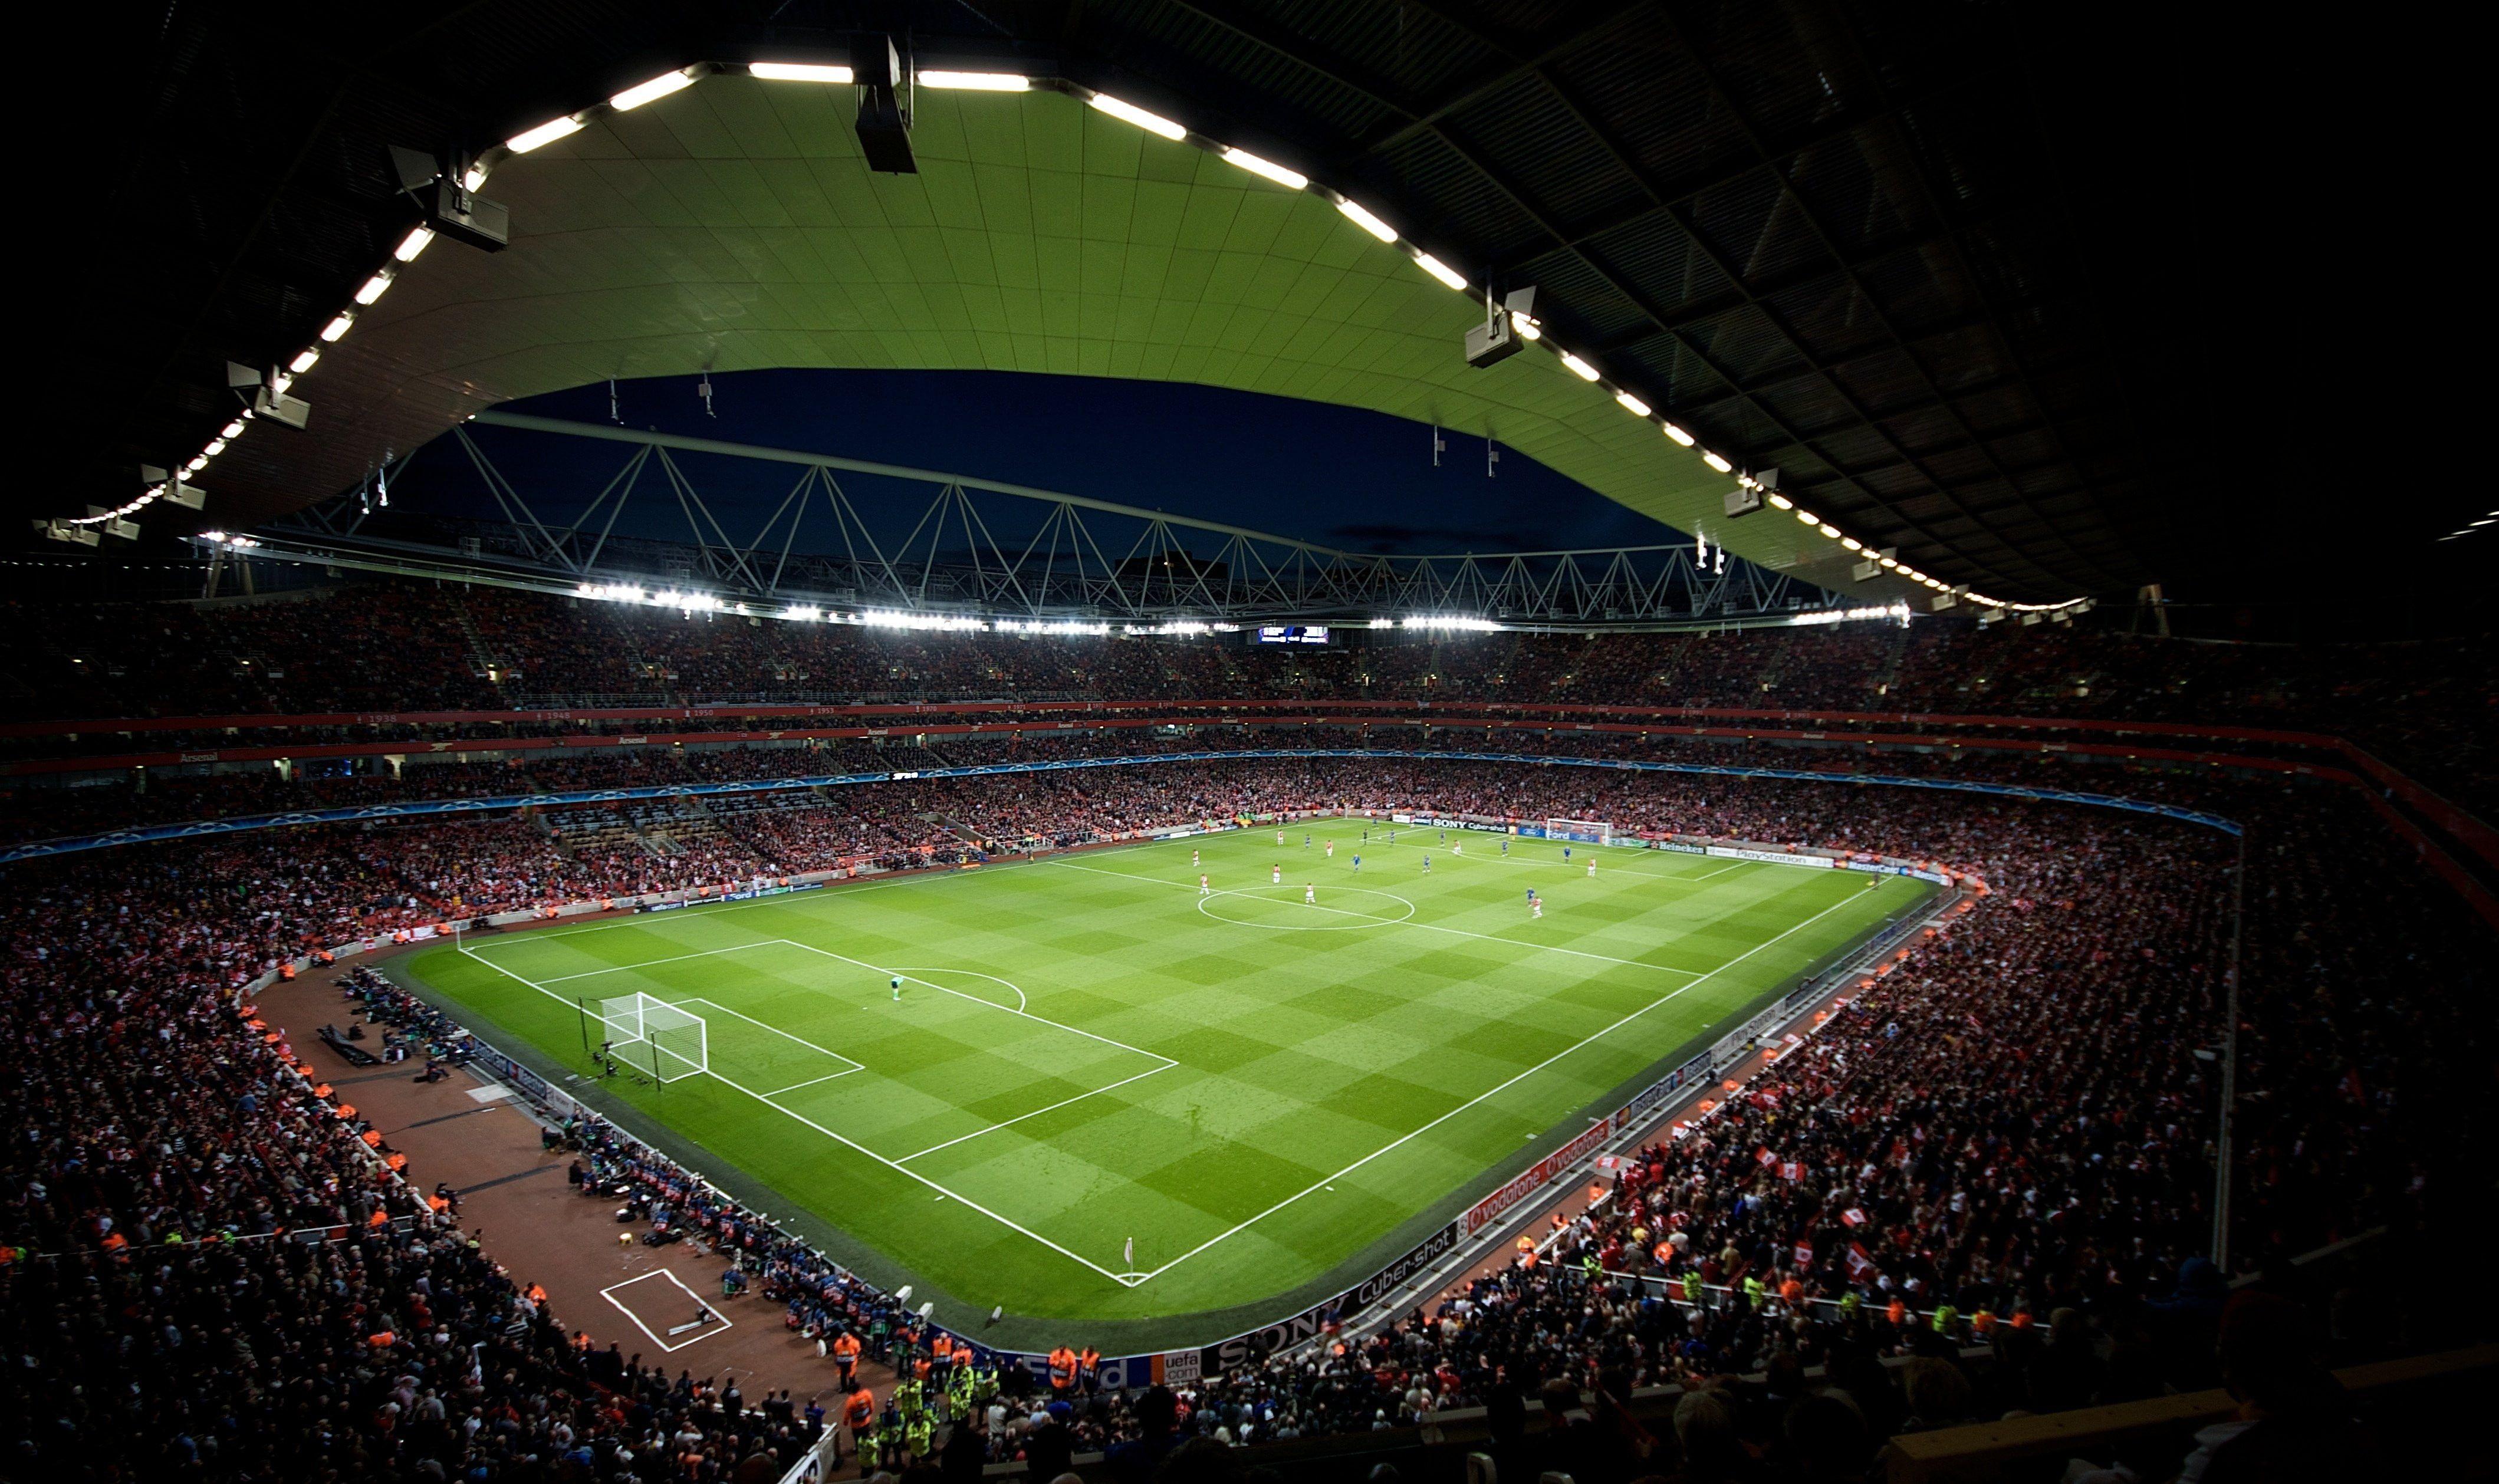 Champions Emirates League Soccer Stadium 4k Wallpaper Hdwallpaper Desktop In 2020 Soccer Field Stadium Stadium Wallpaper